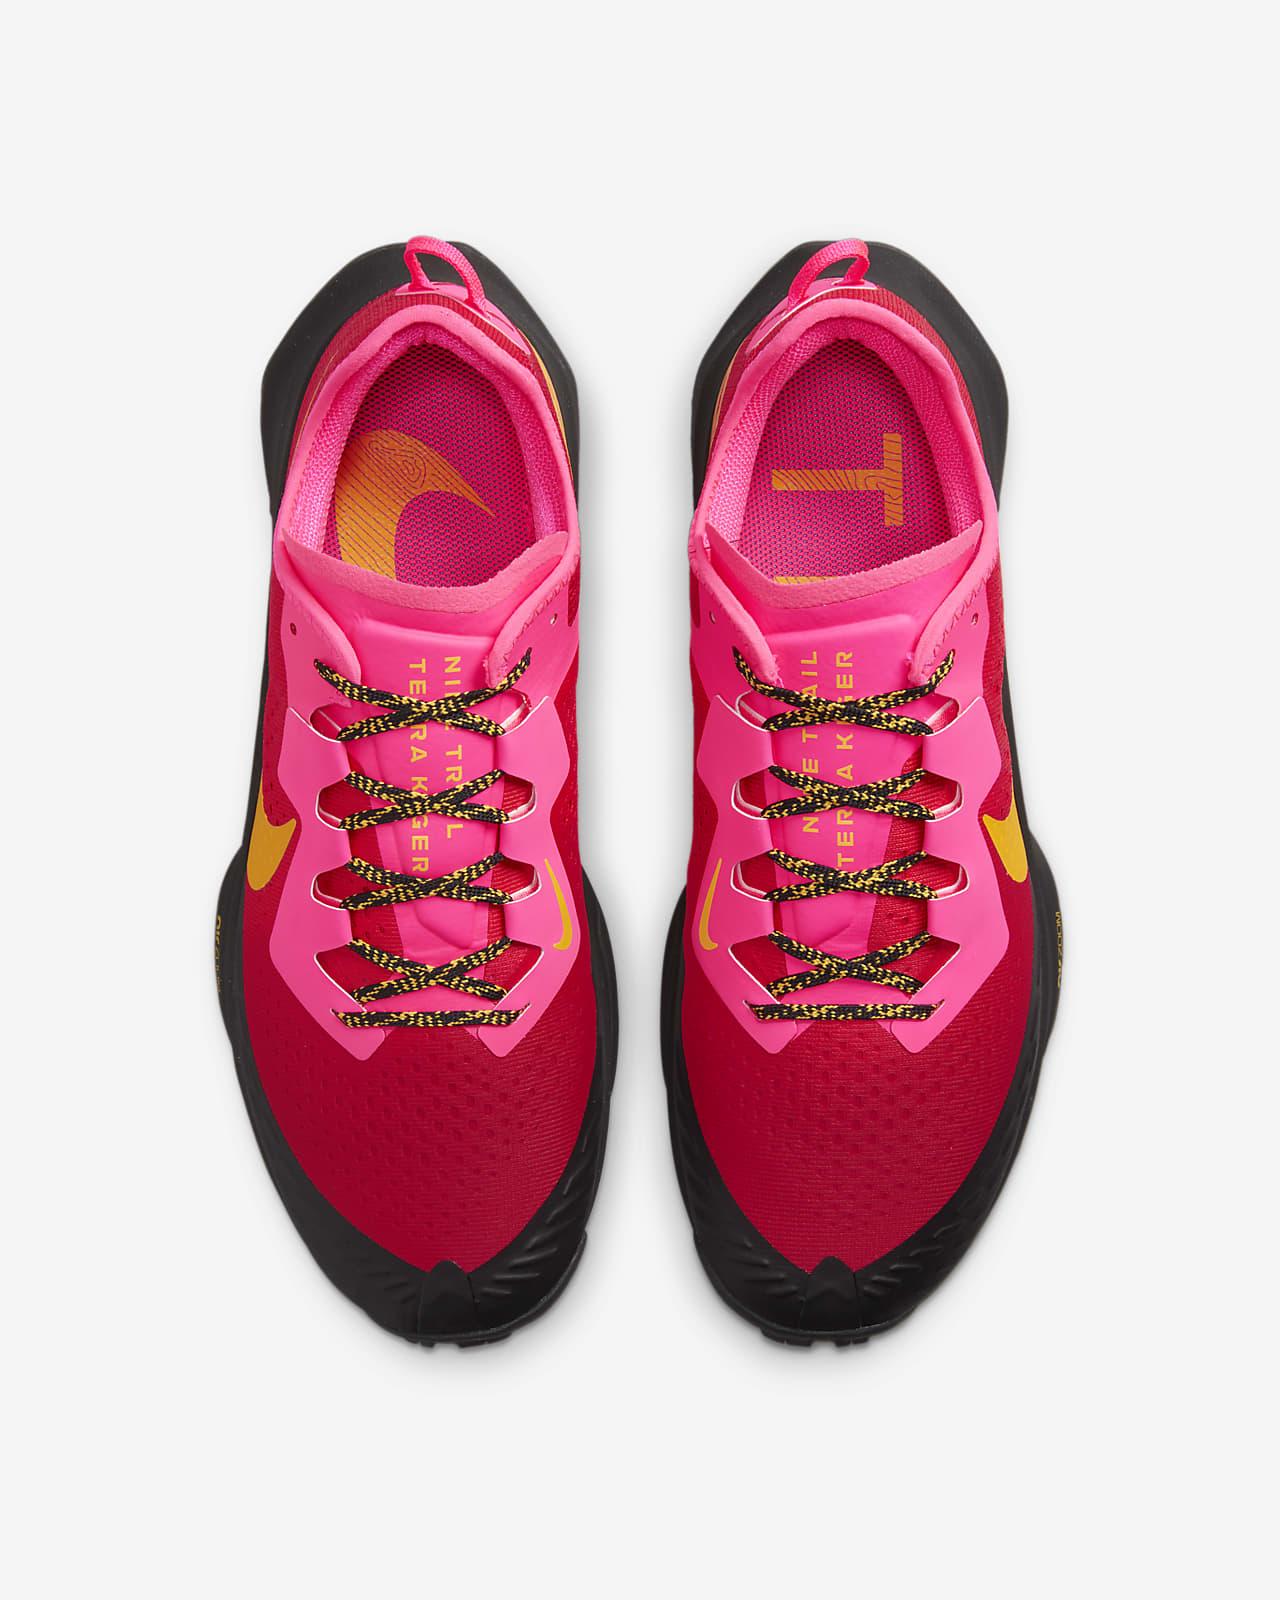 Nike Air Zoom Terra Kiger 7 Men's Trail Running Shoe. Nike LU